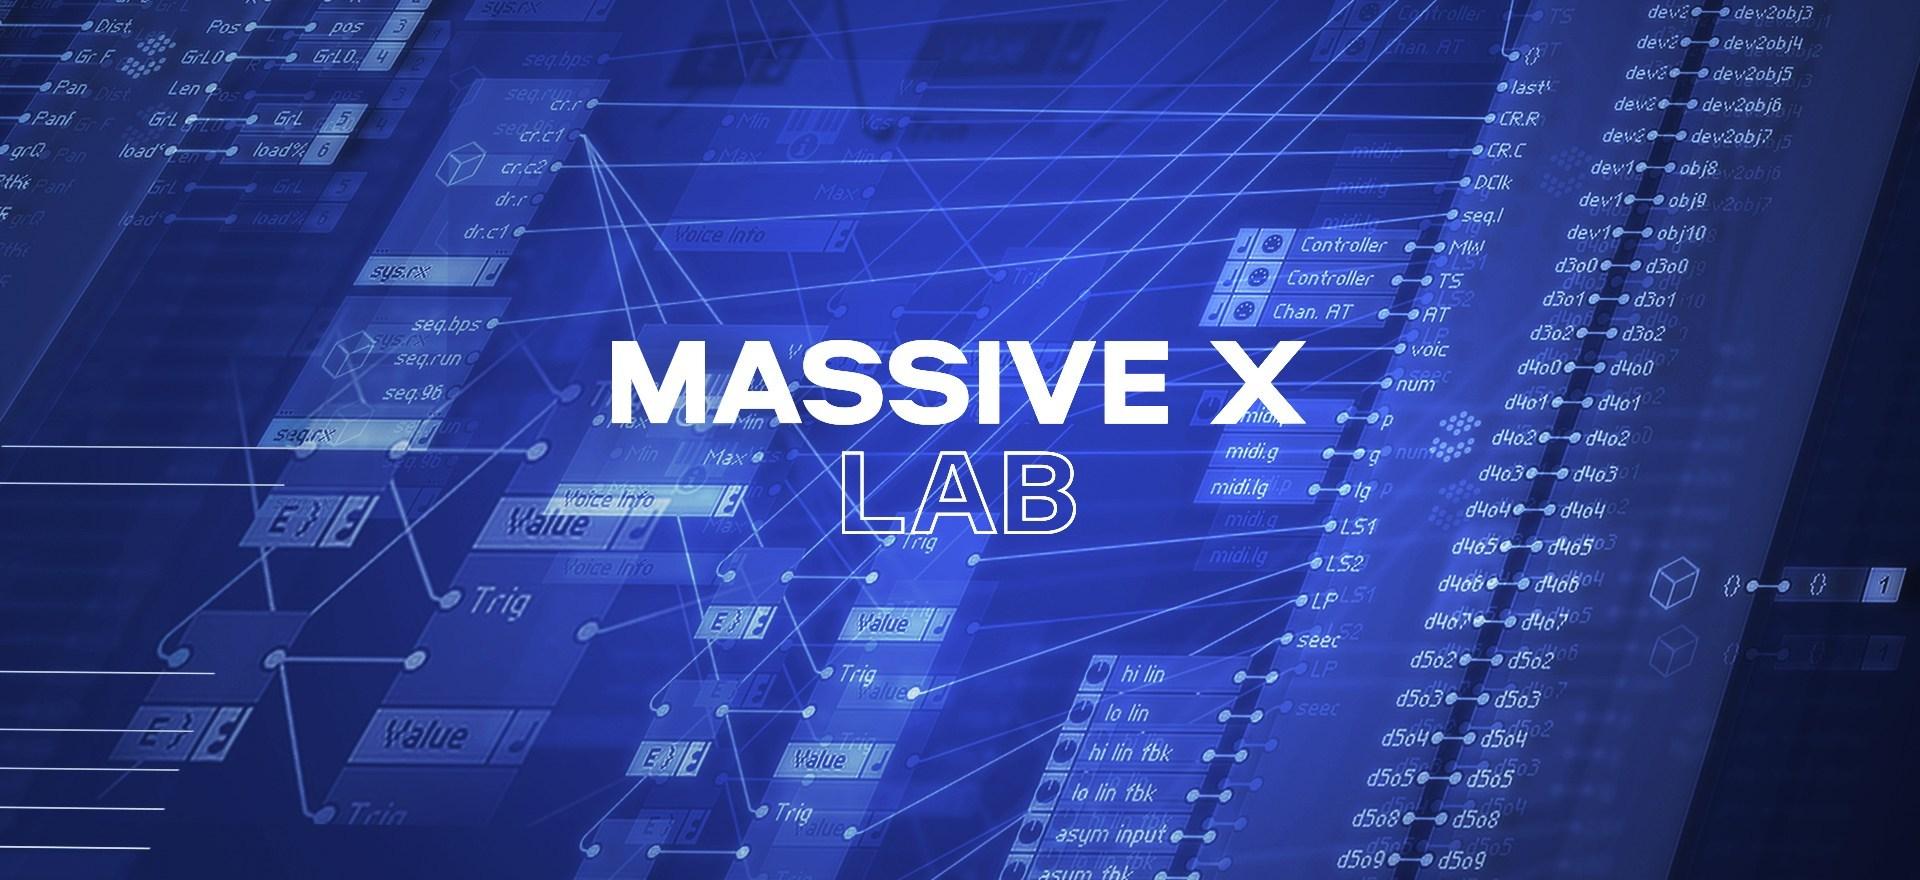 Native Instruments Massive X teasers revealed